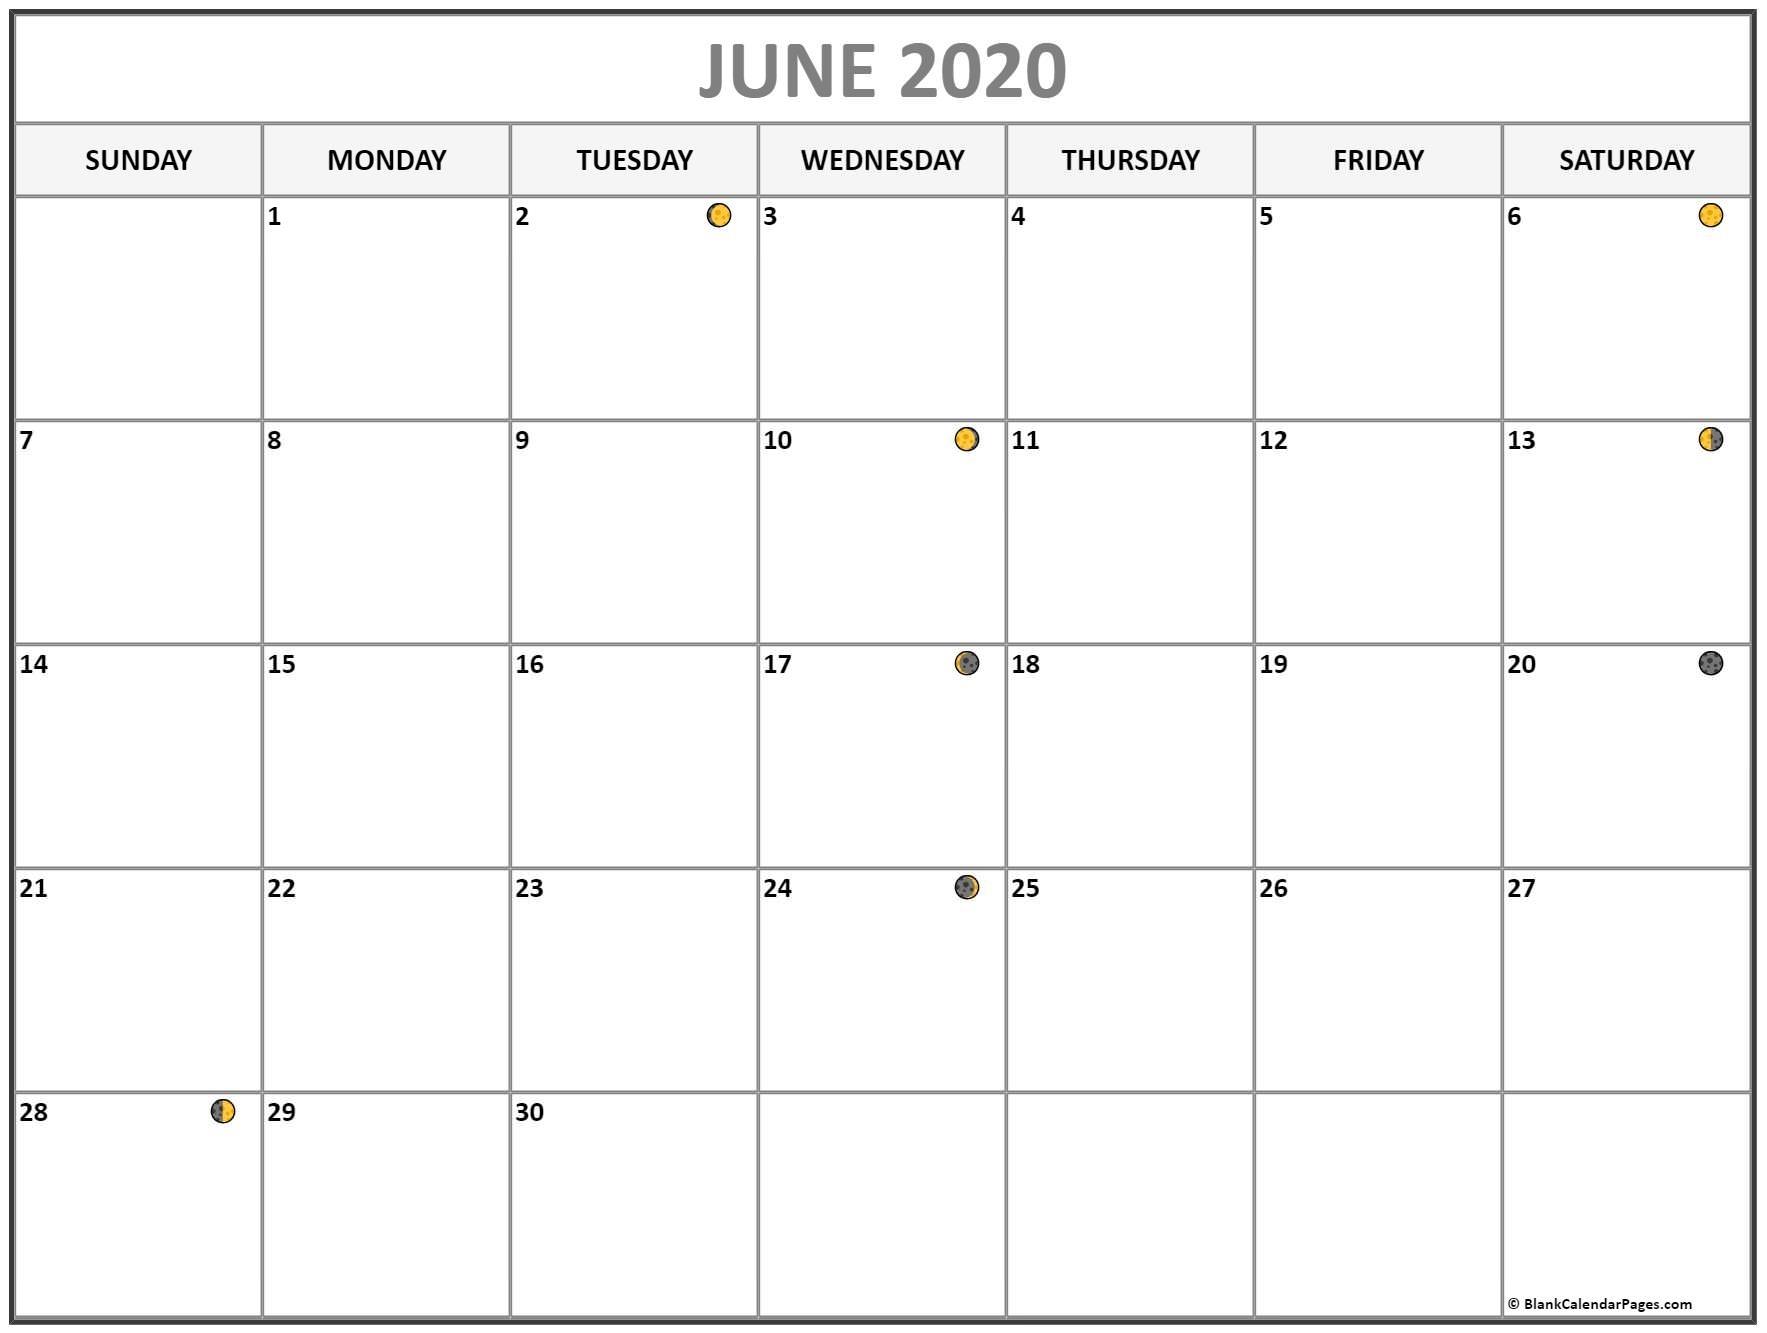 June 2020 Lunar Calendar | Moon Phase Calendar